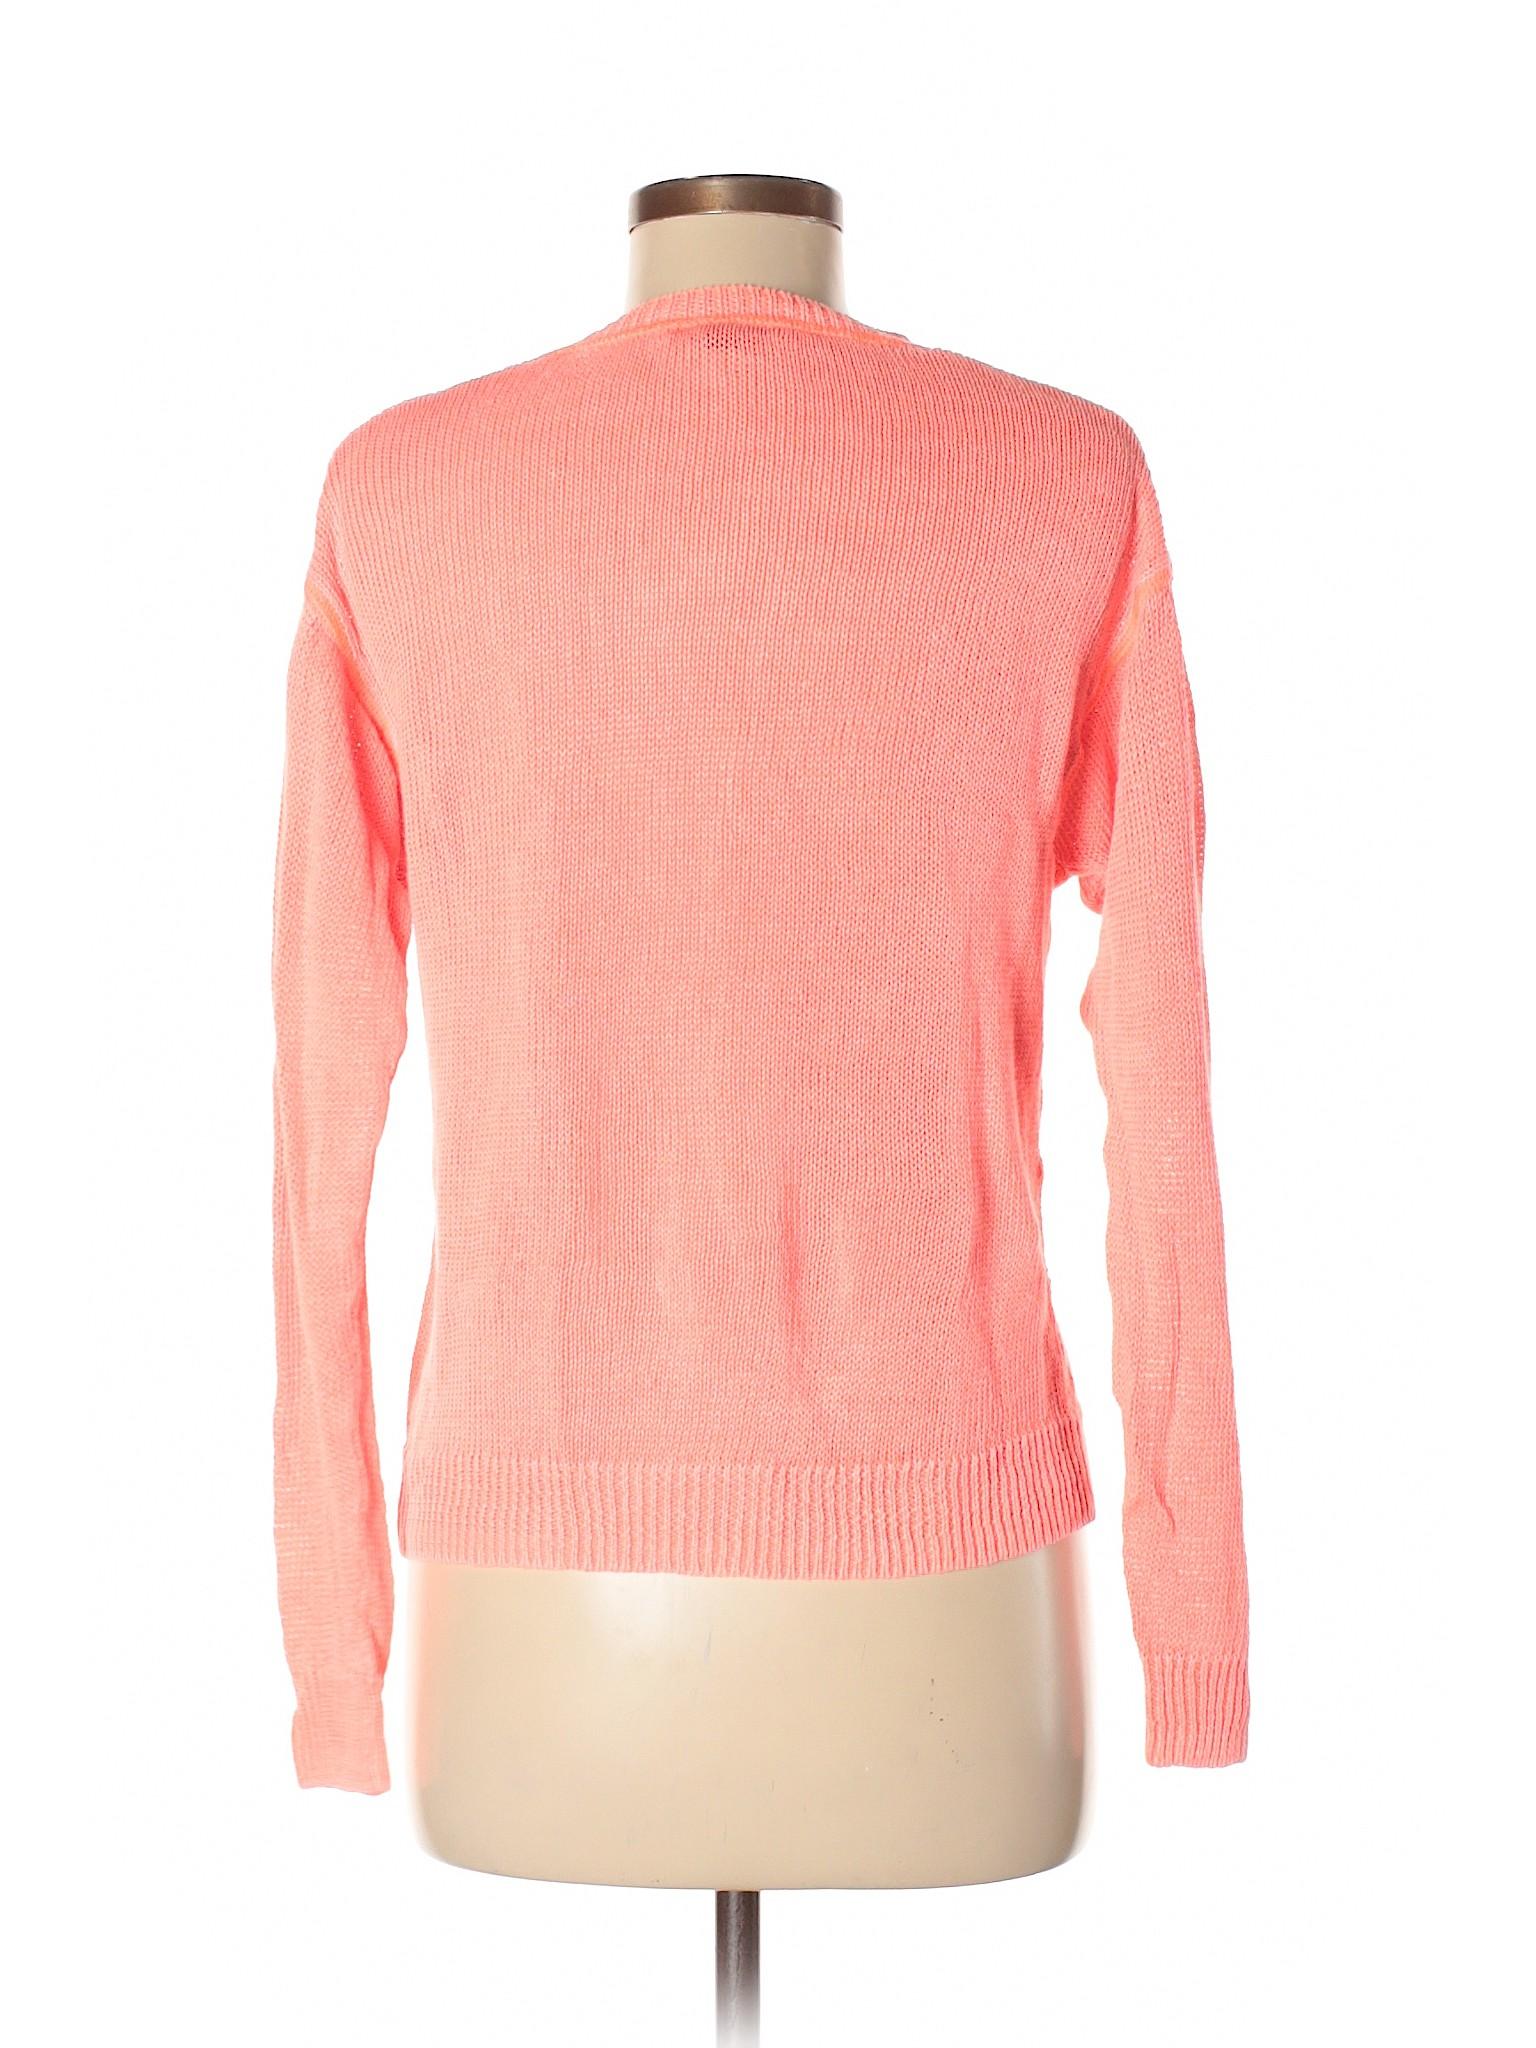 J Pullover Crew winter Sweater Boutique 87q0xt